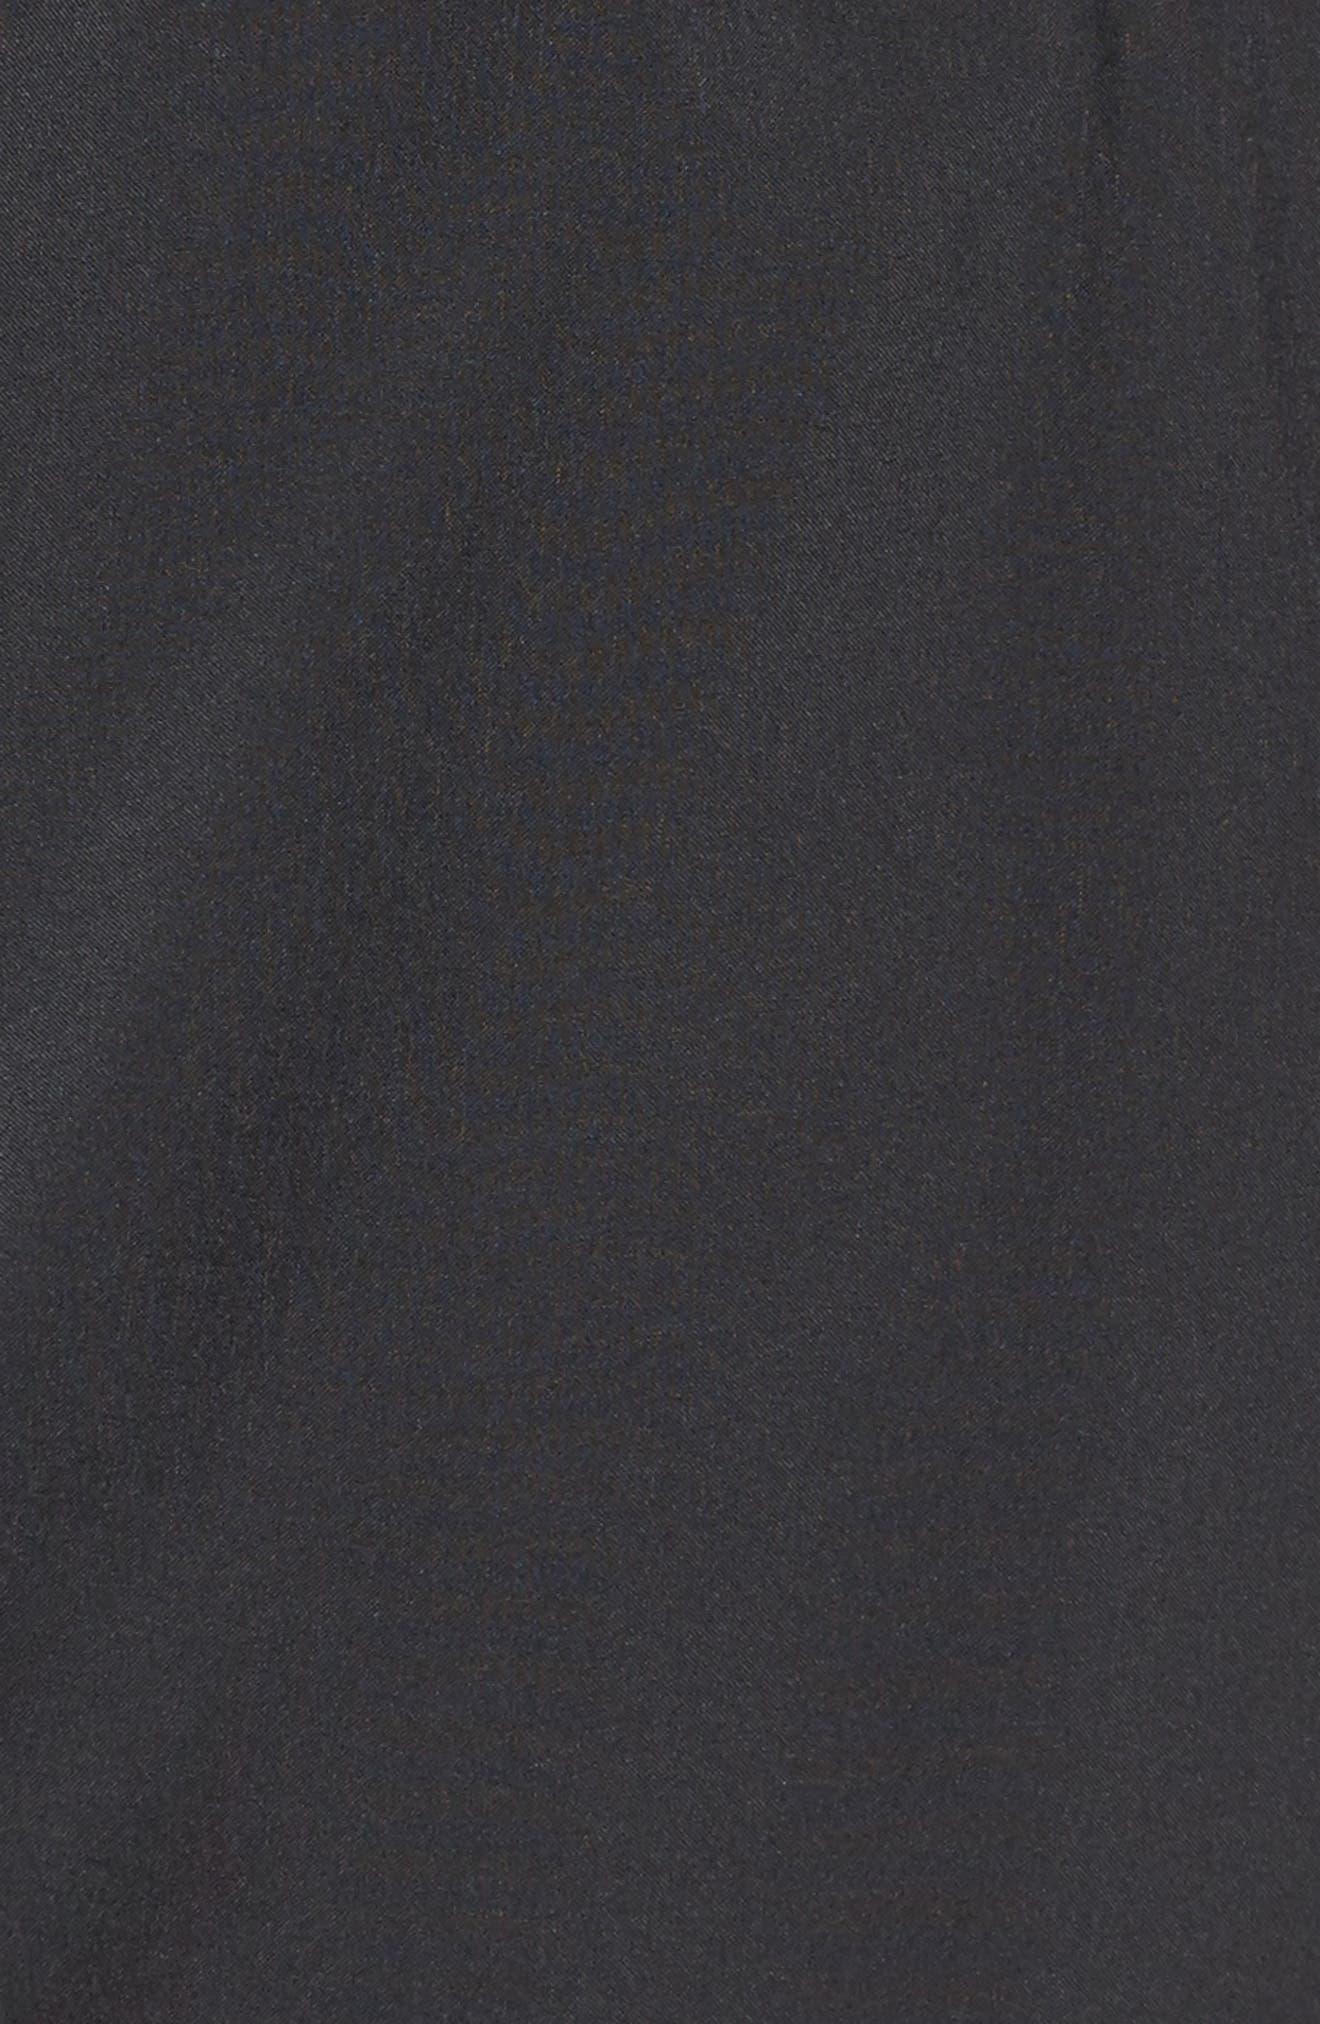 Chaser Running Shorts,                             Alternate thumbnail 14, color,